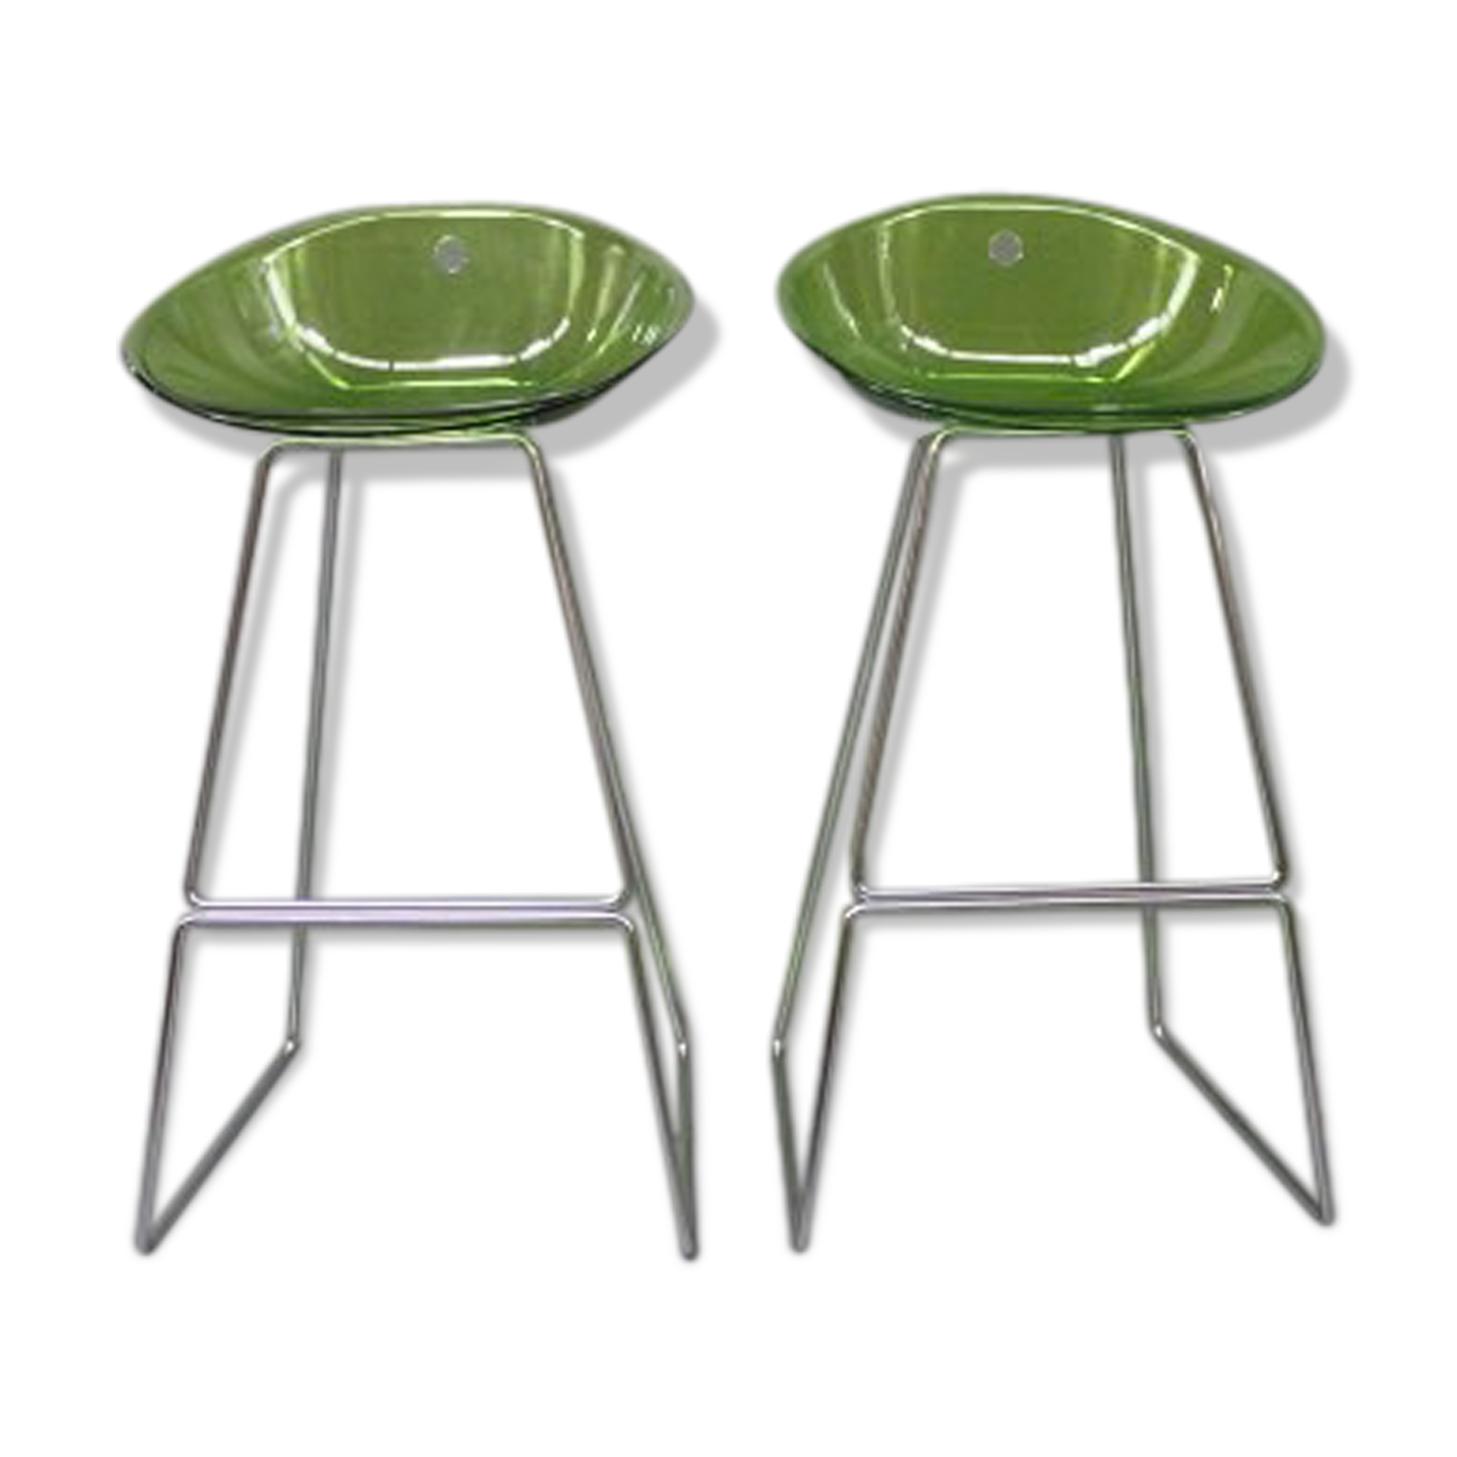 Pair of Pedrali bar stool